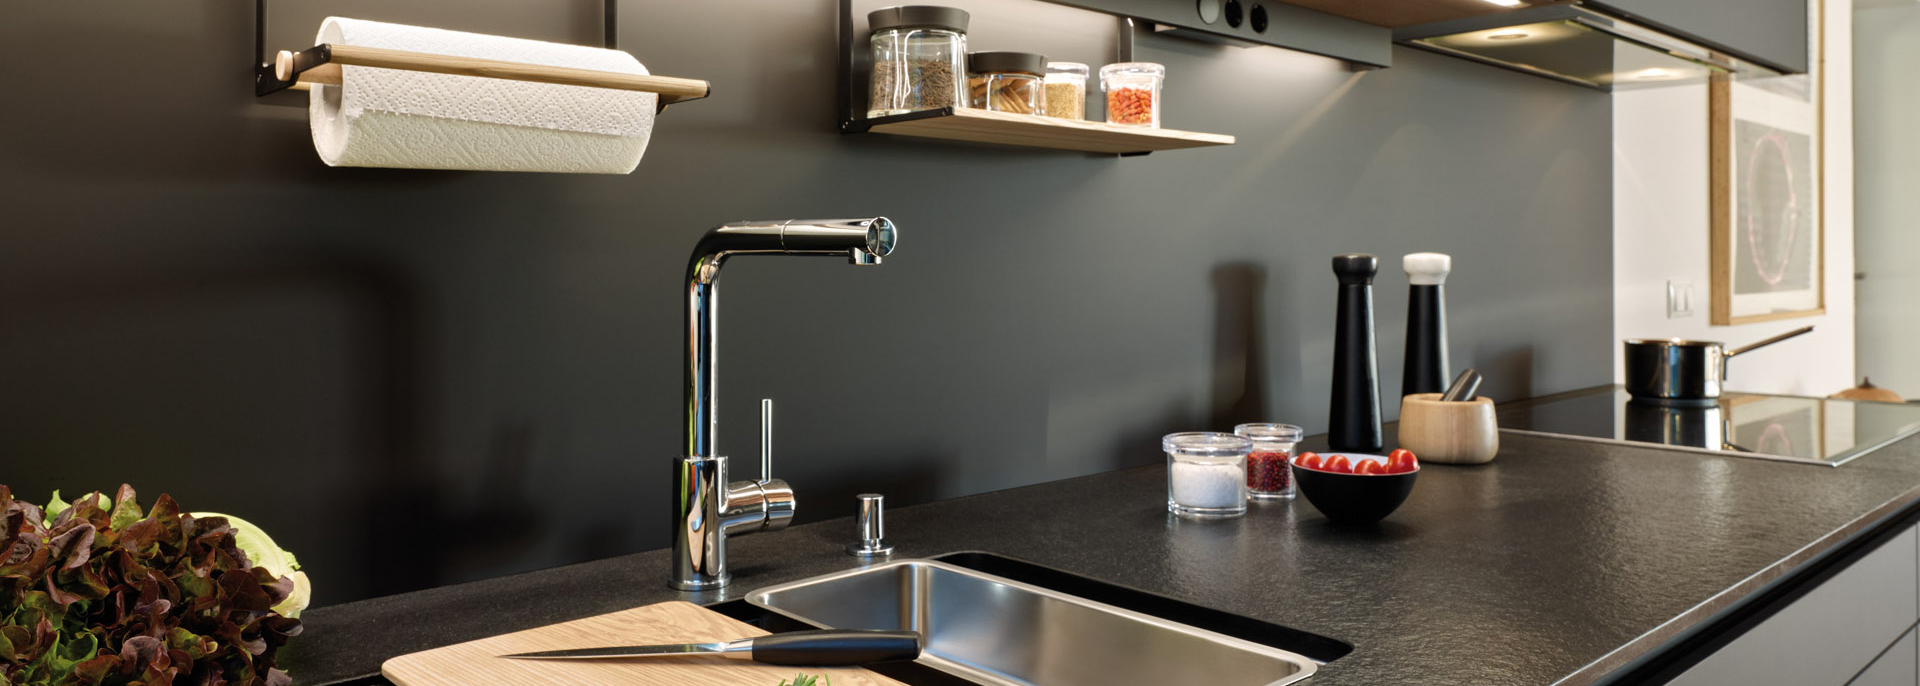 dos-fuentes-de-iluminacion-led-en-cocinas-en-paralelo